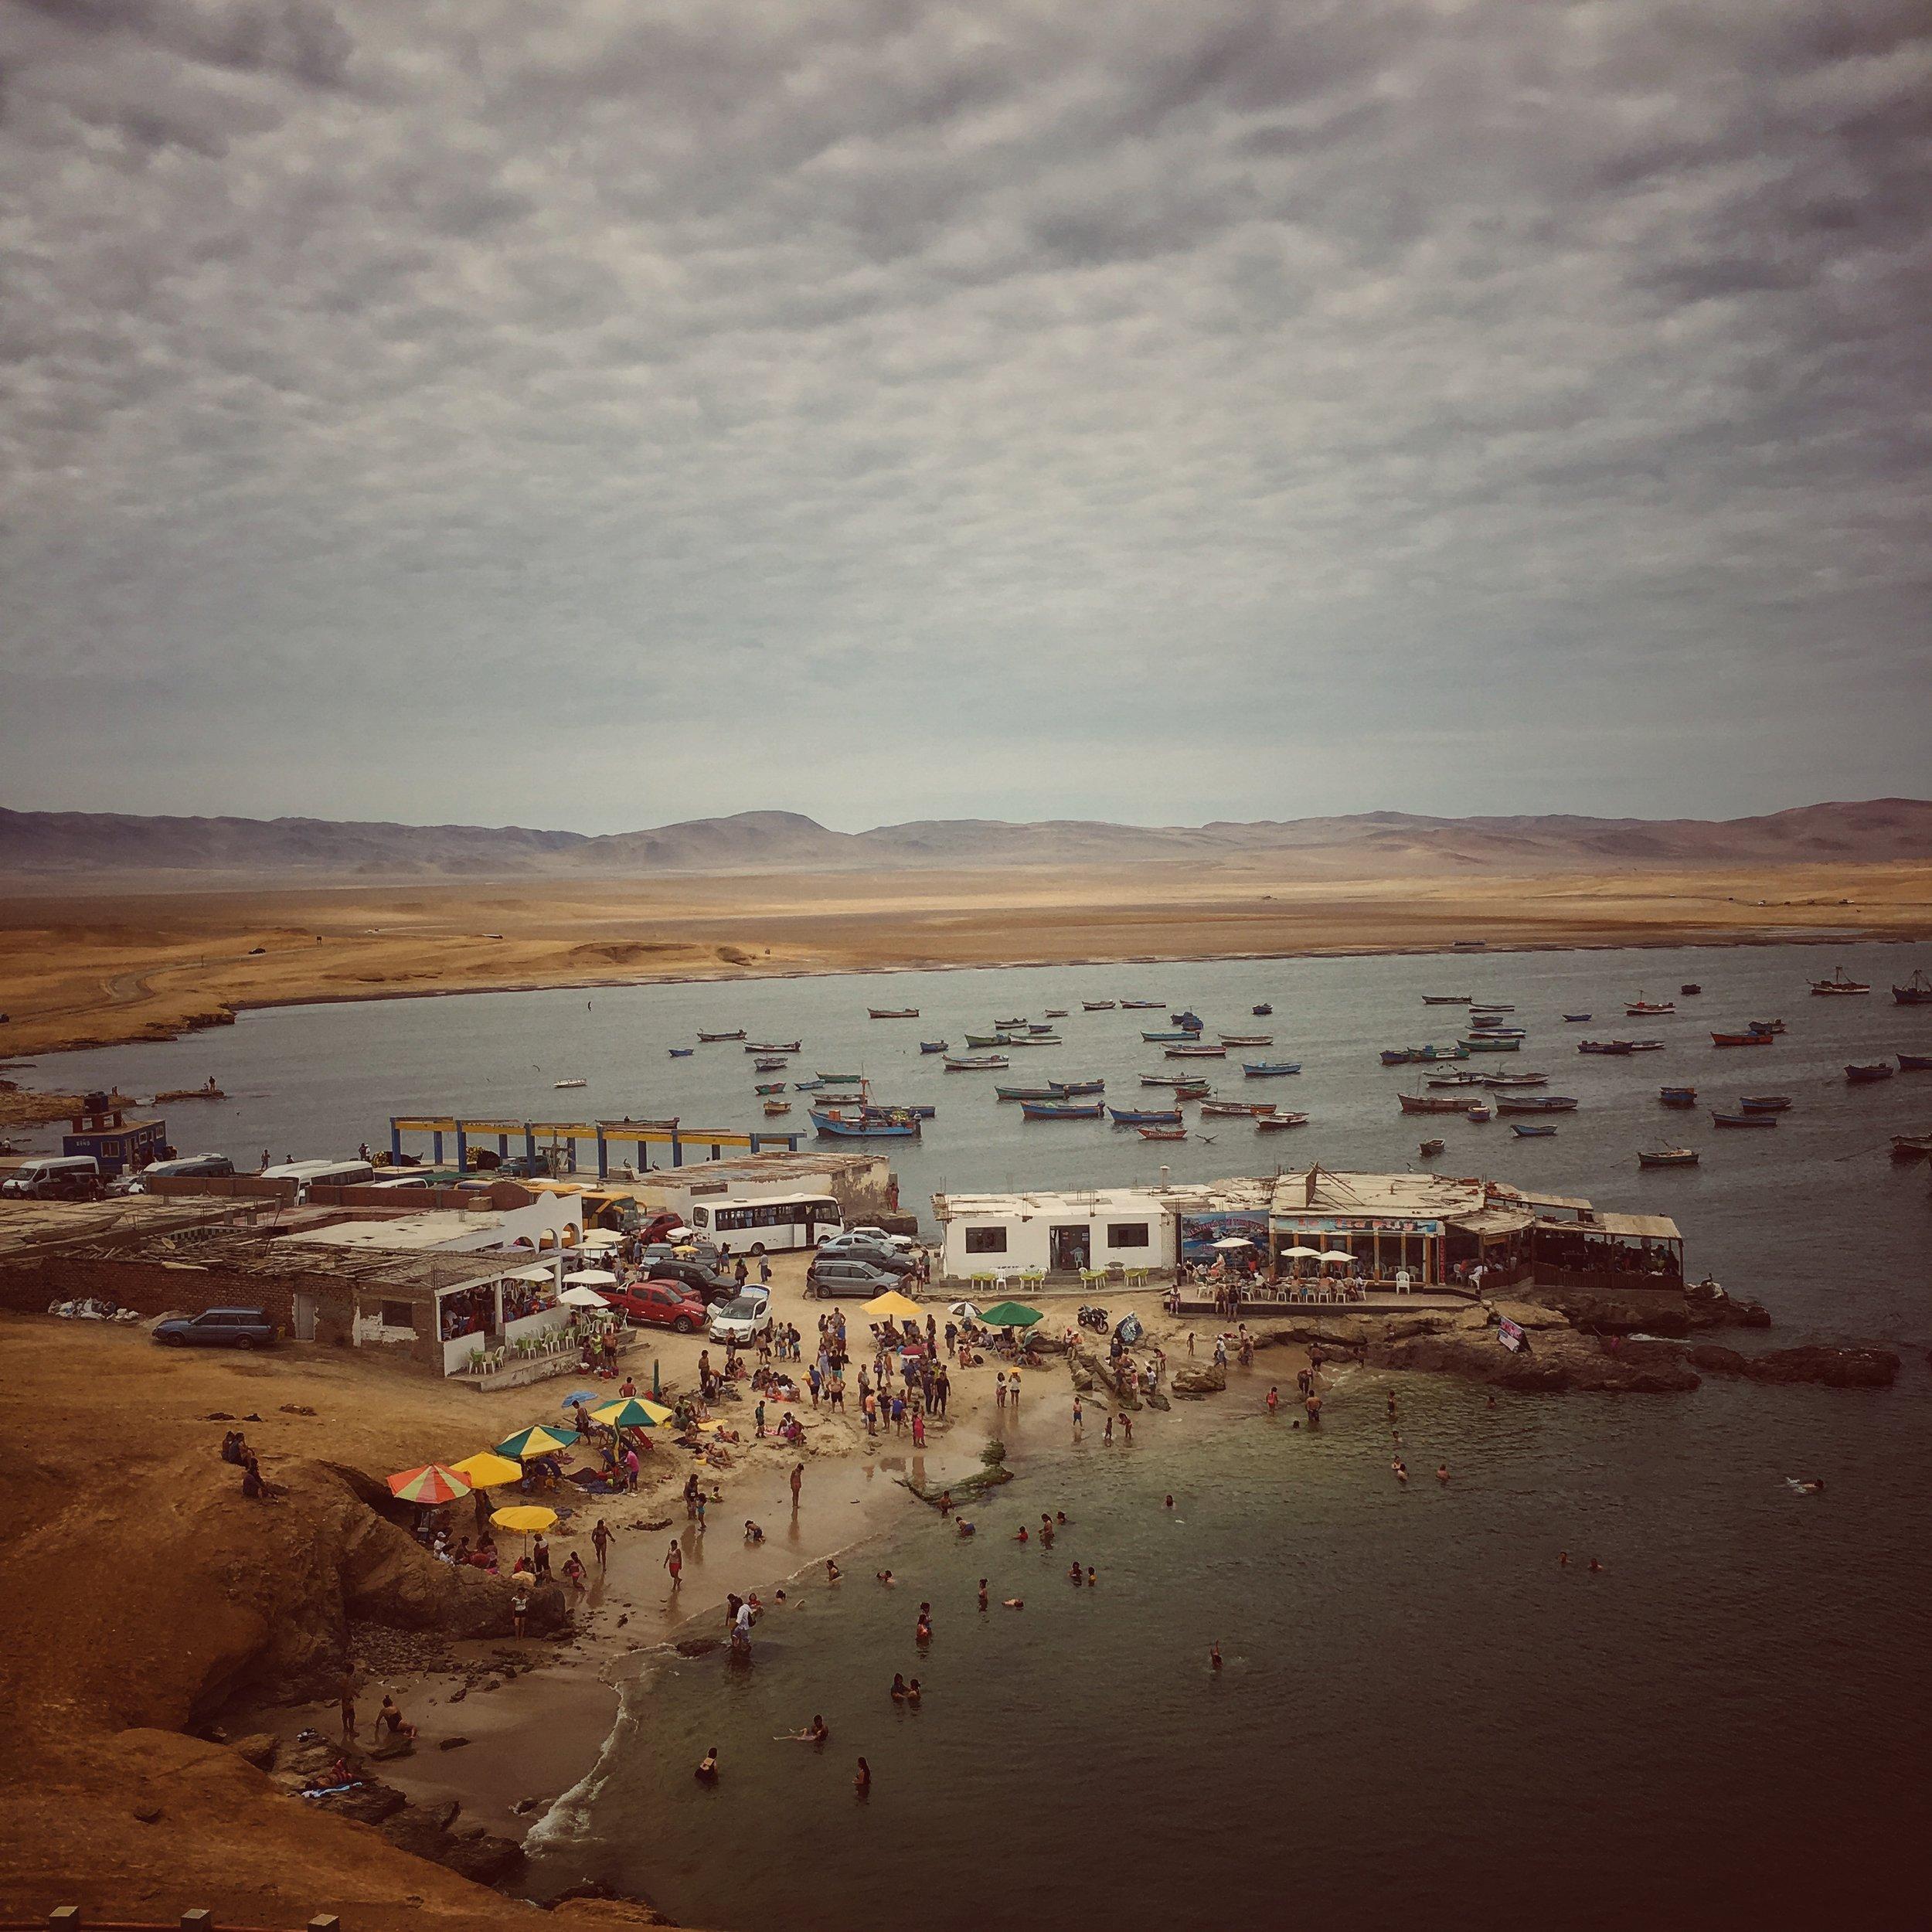 sunday arvo beach & ceviche : reserva nacional de paracas